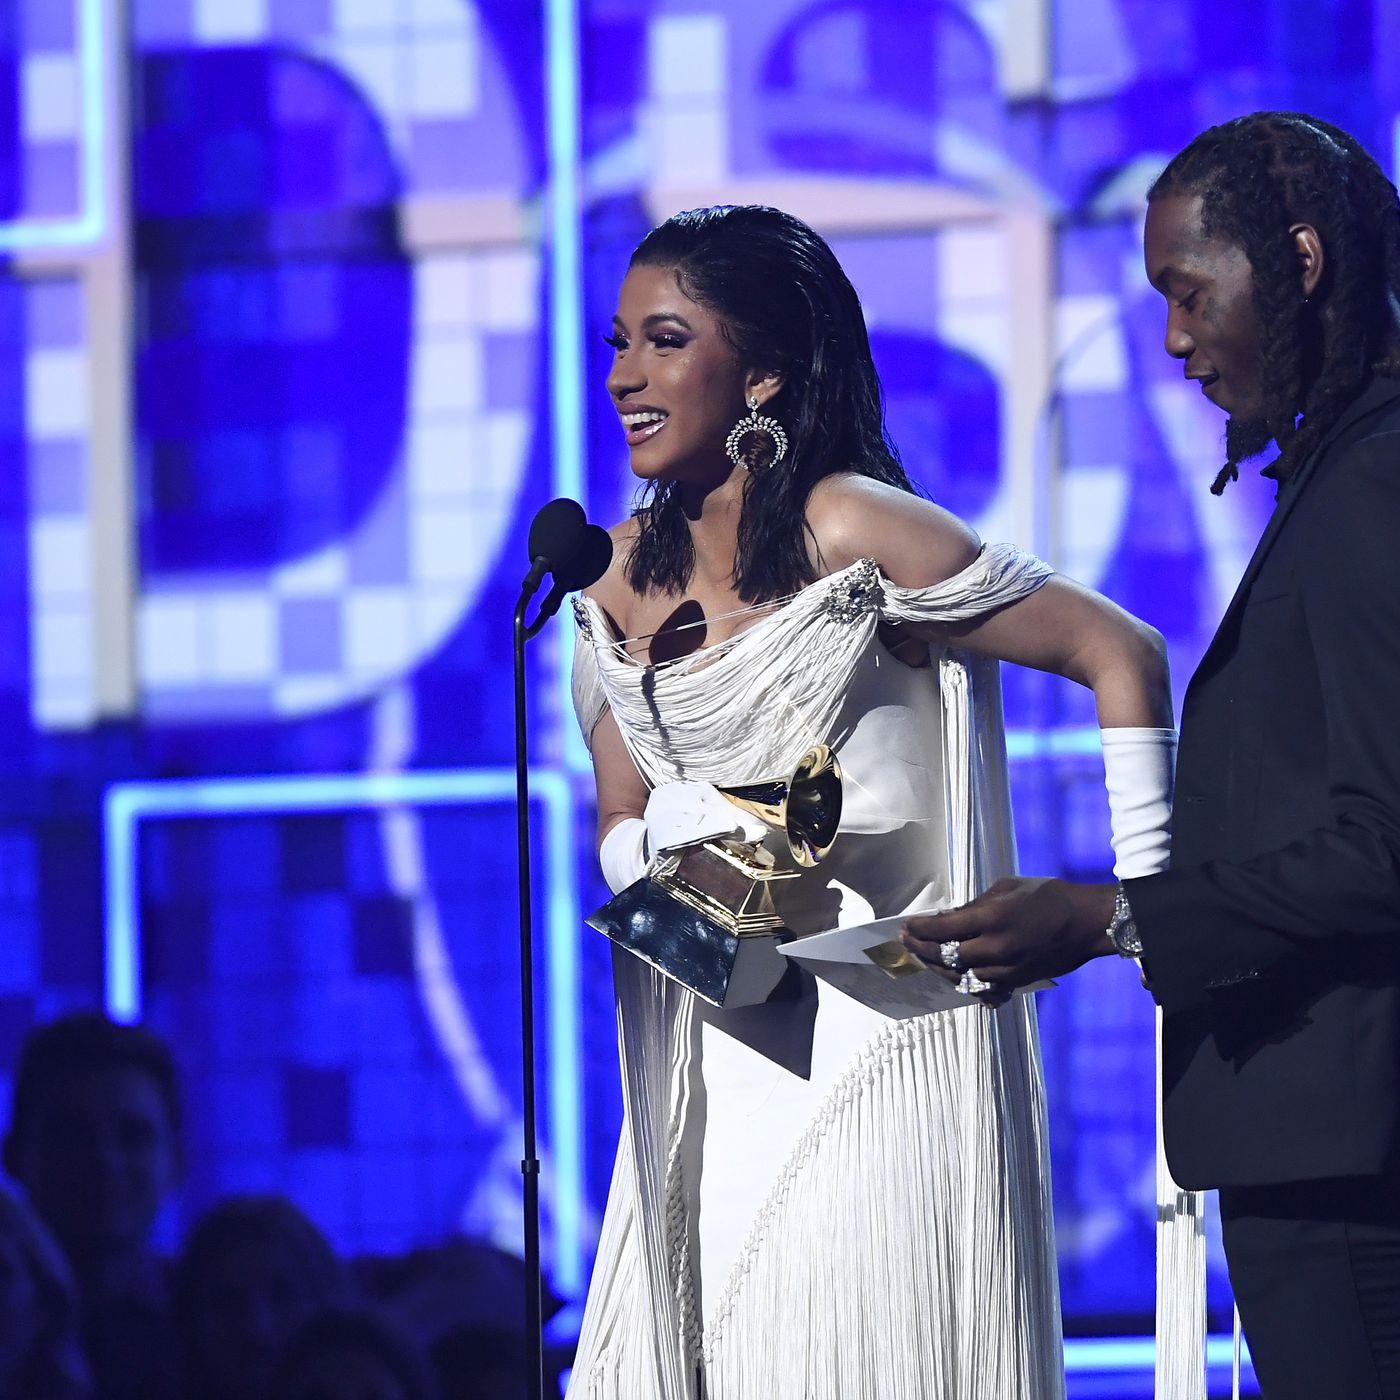 Grammy 2019: the complete winners list - Vox